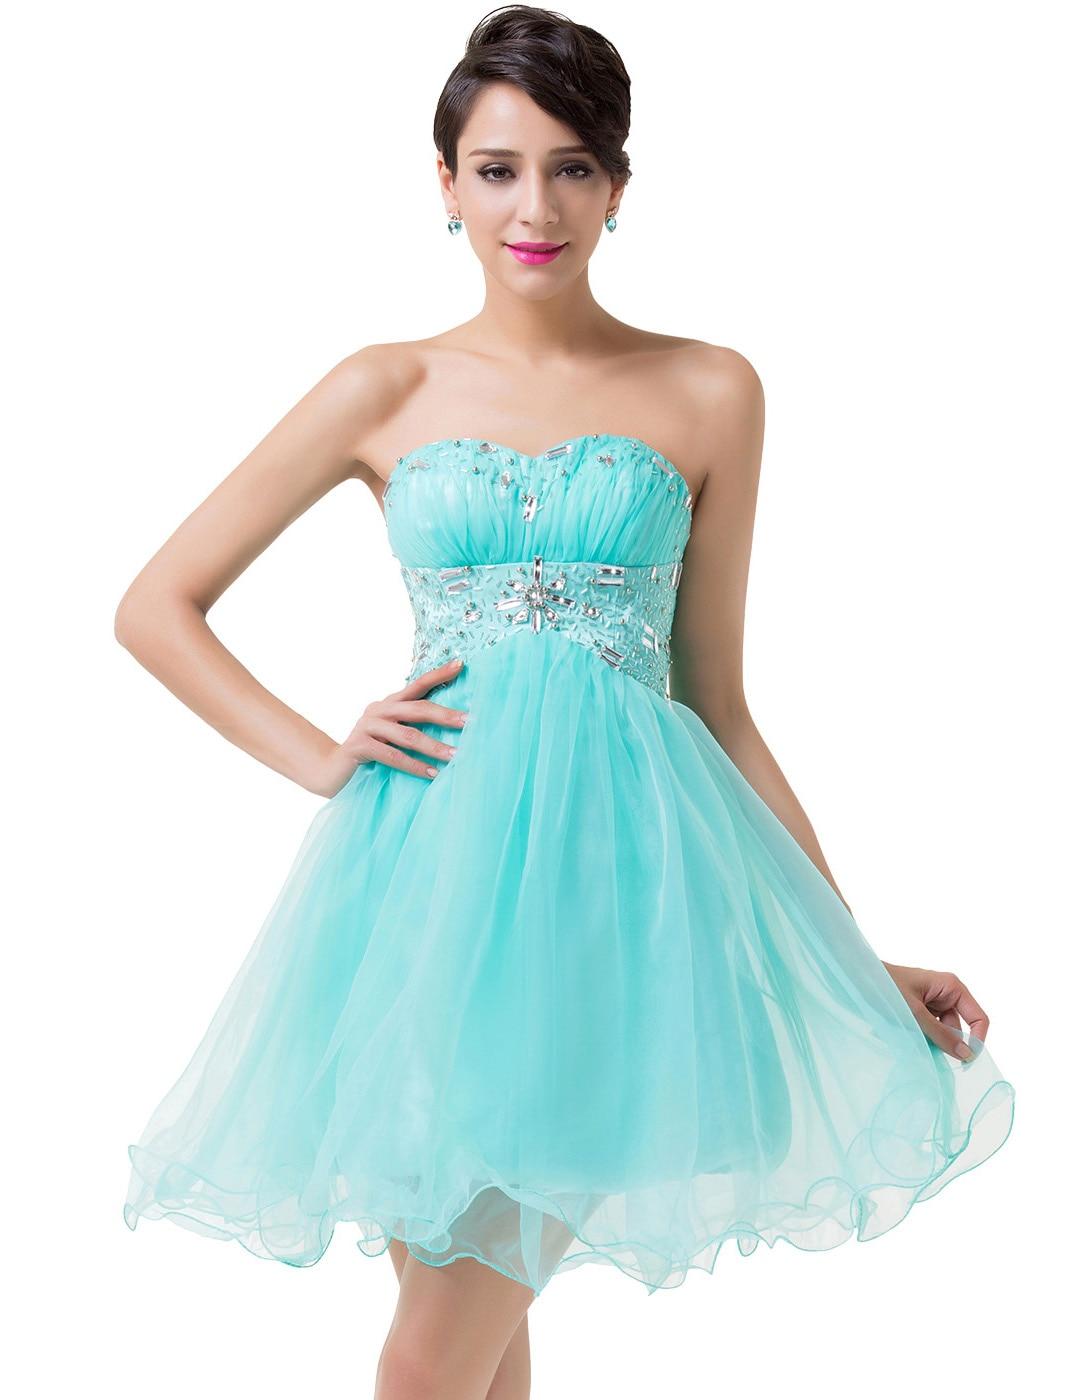 Short teal cocktail dresses – Dress fric ideas